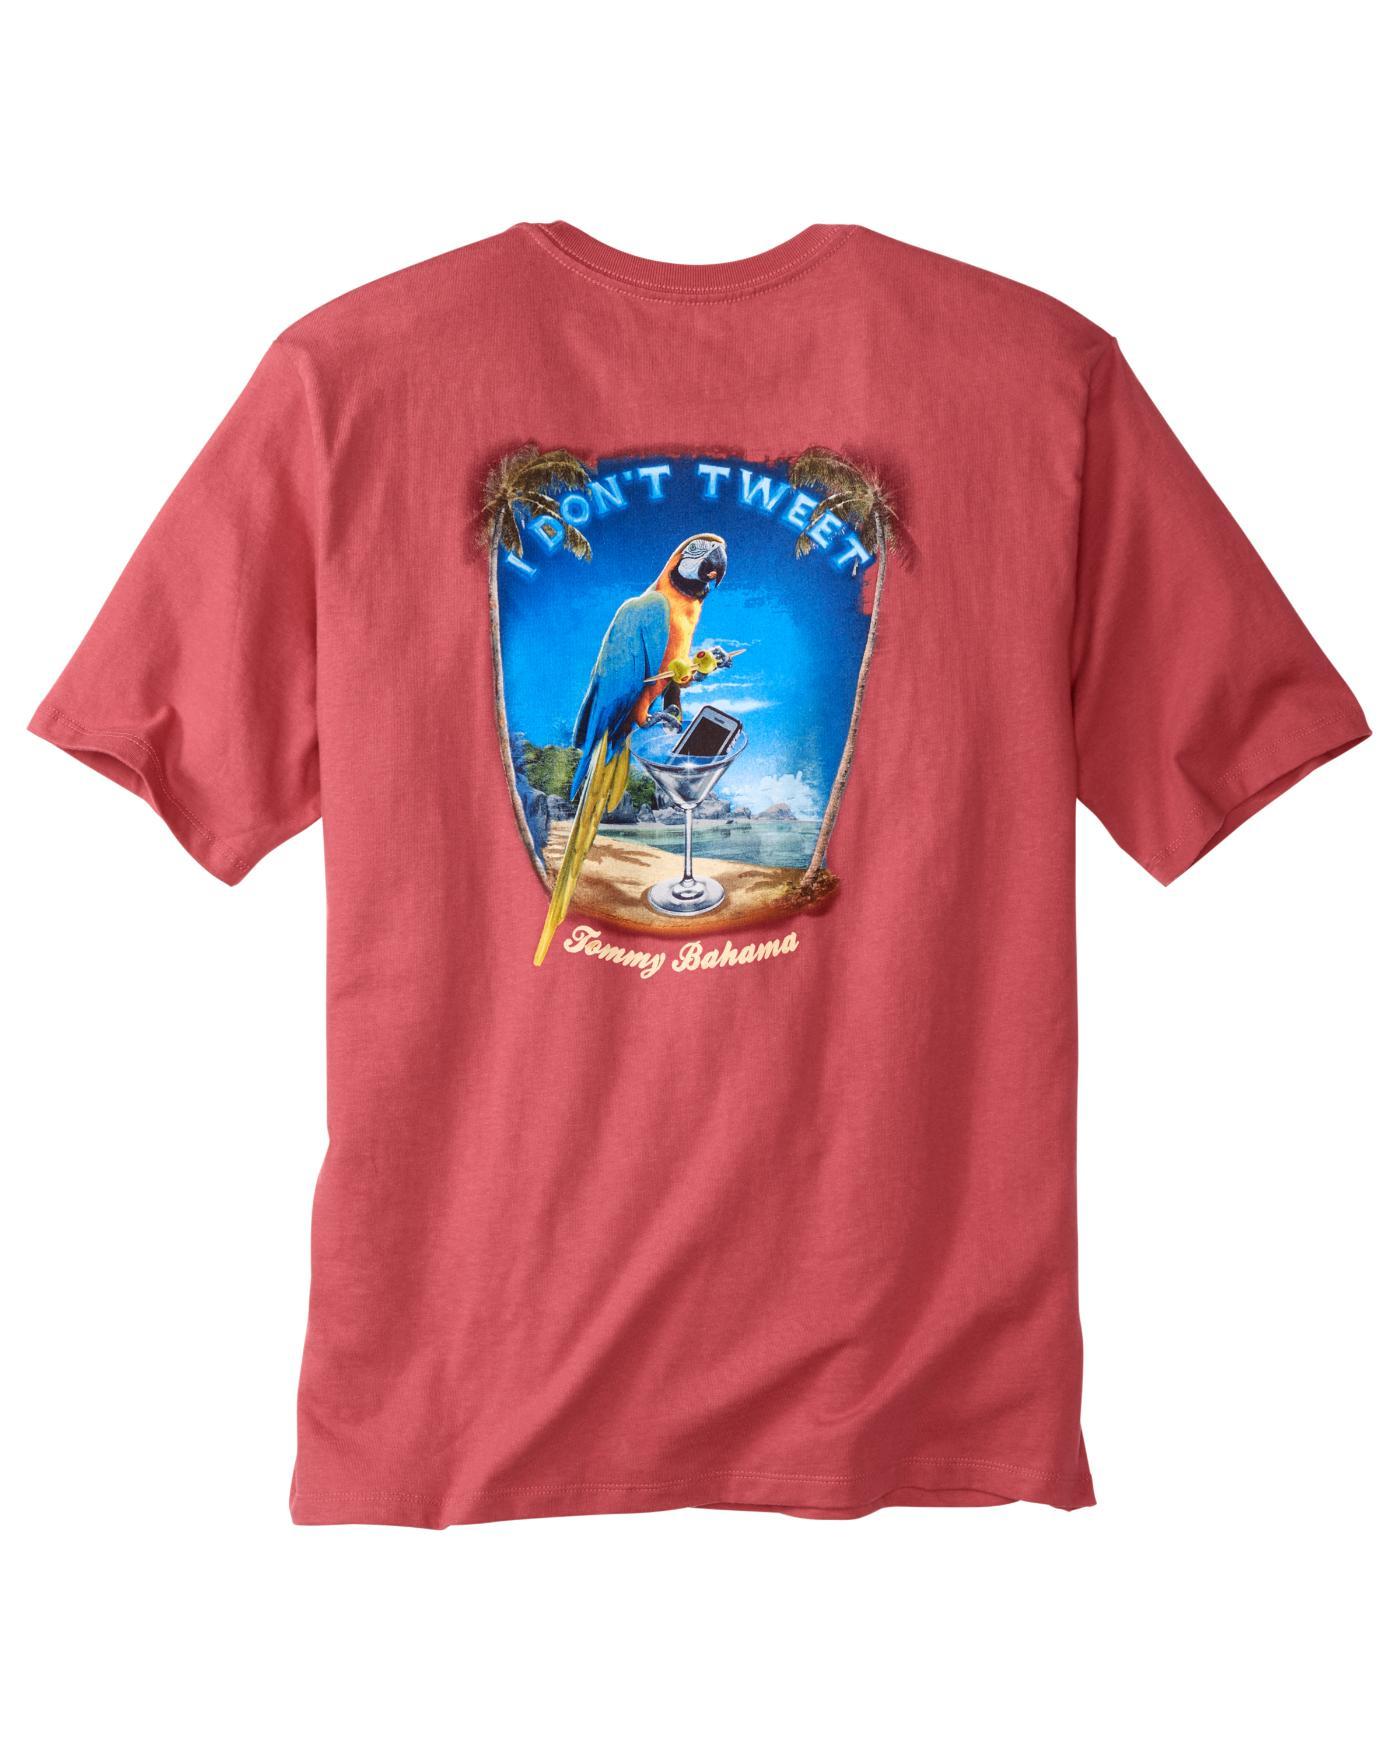 Tommy bahama i don 39 t tweet t shirt ebay for Tommy bahama florida shirt